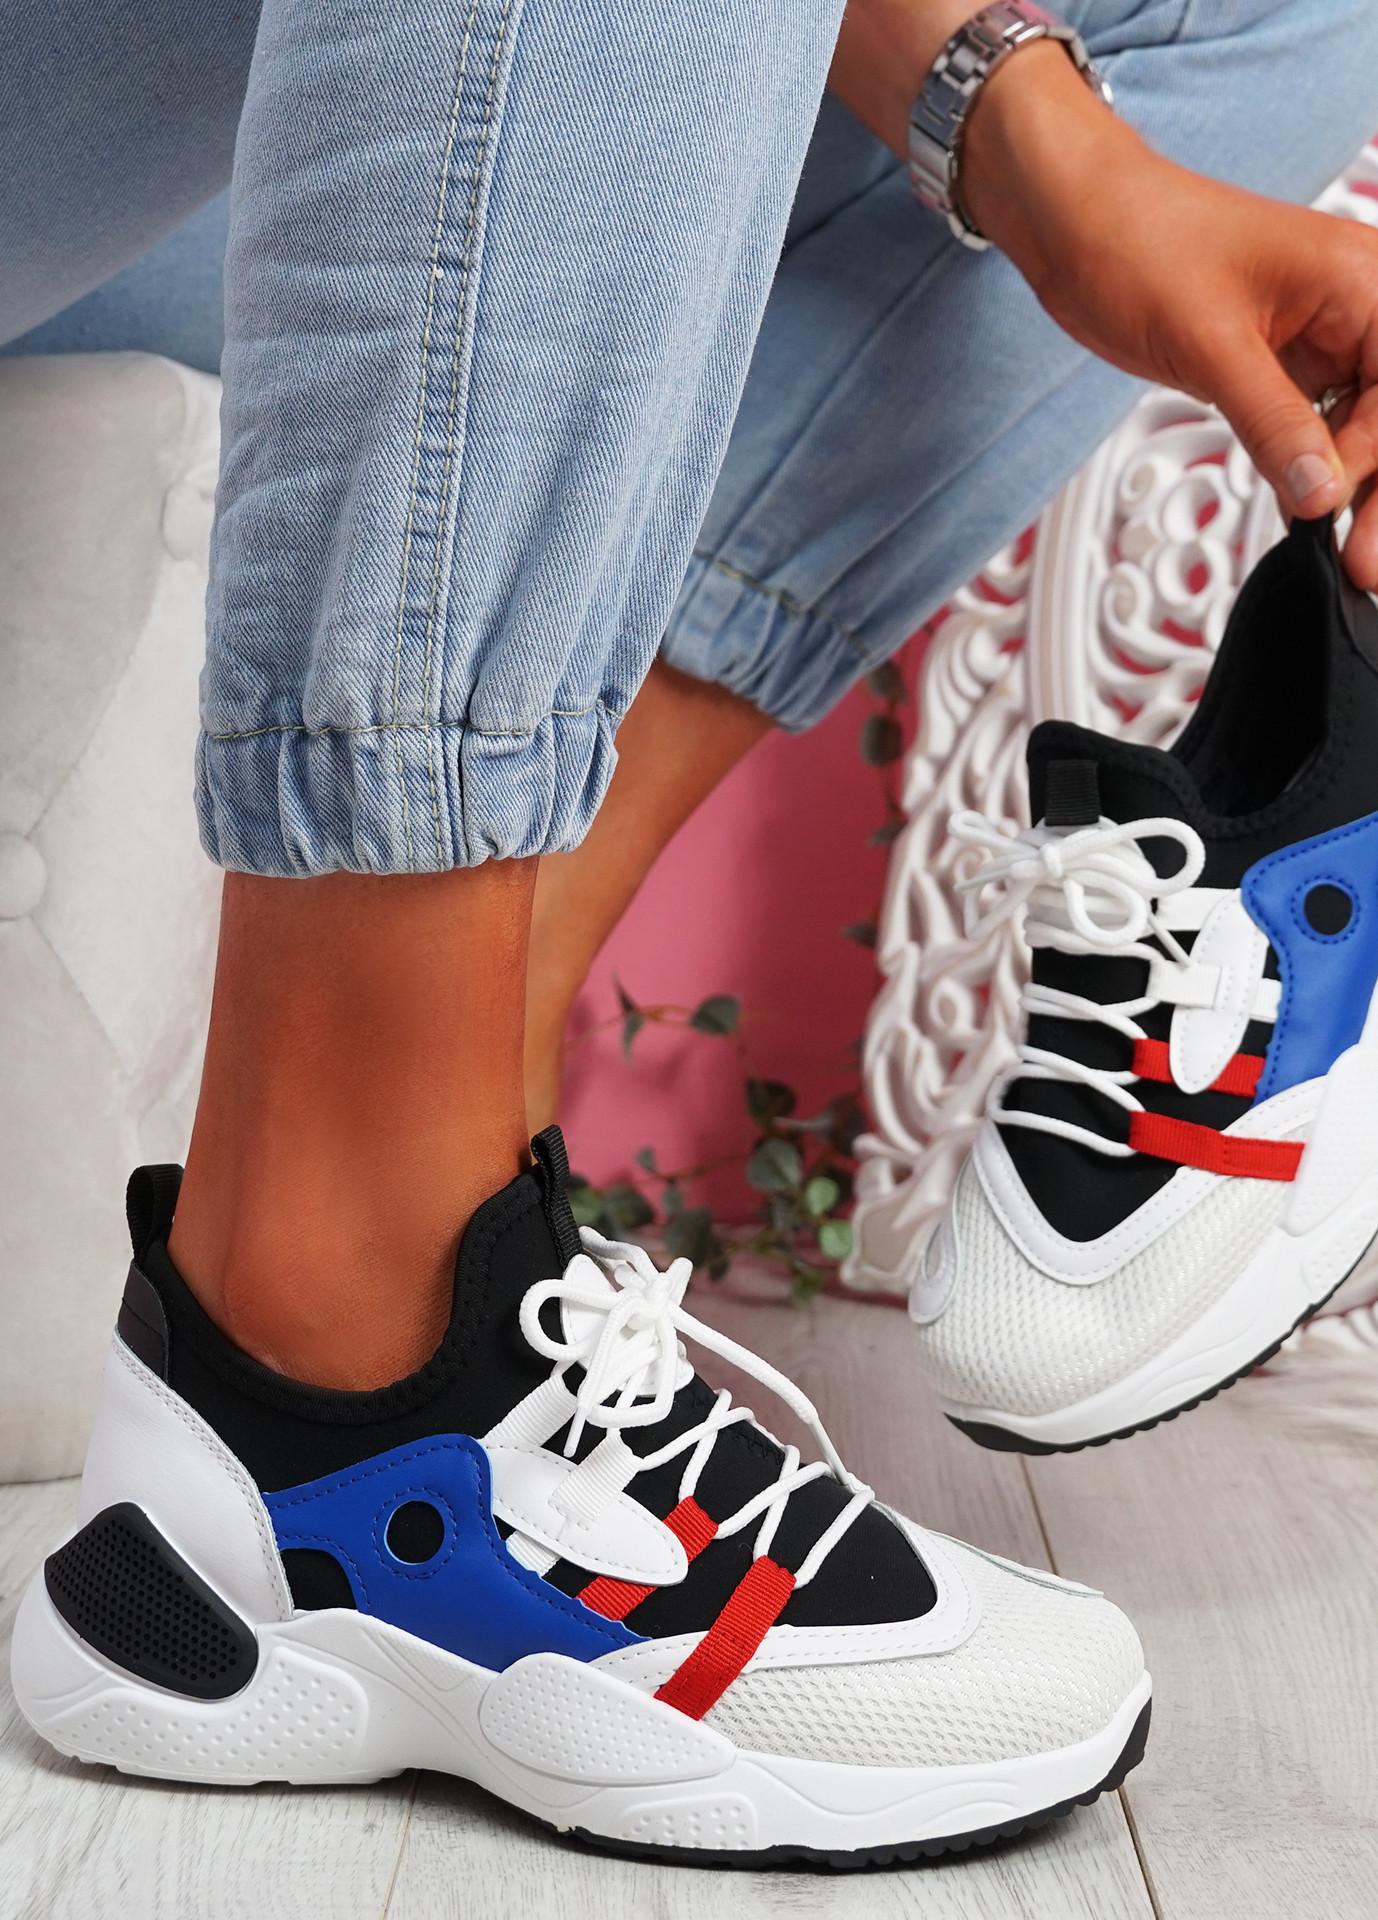 Nozo Black Chunky Sneakers